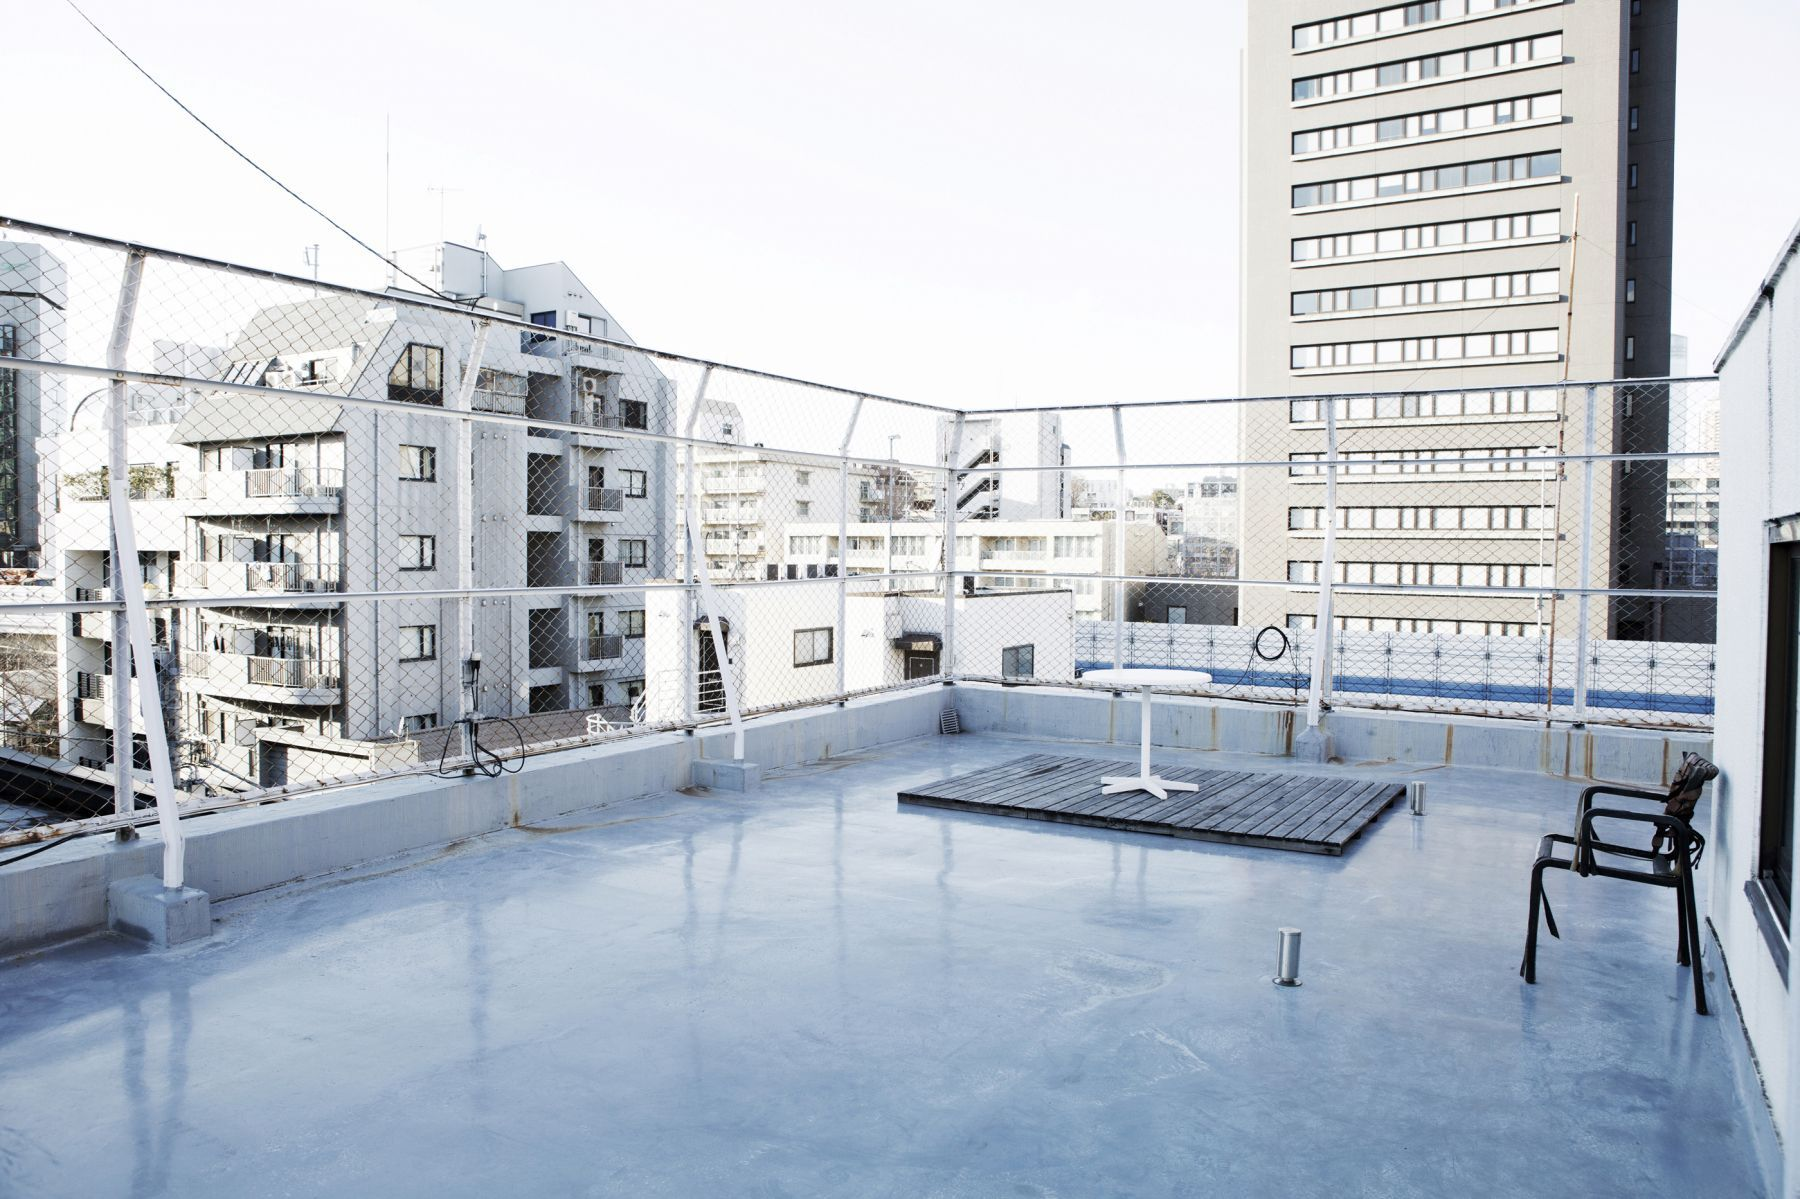 studio ConTRail (スタジオ コントレイル)屋上 空抜け撮影も可能